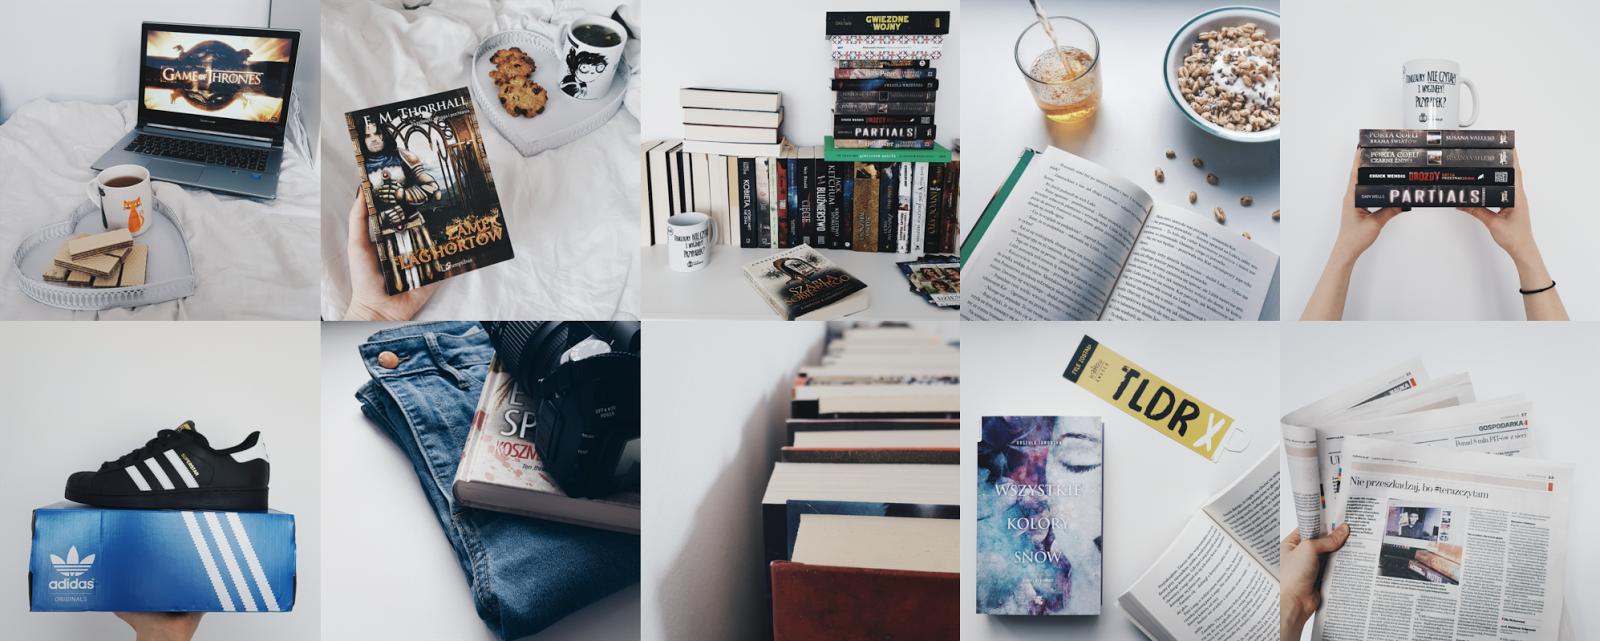 instagram, podsumowanie miesiąca, aparat, książki, buty, superstary, herbata